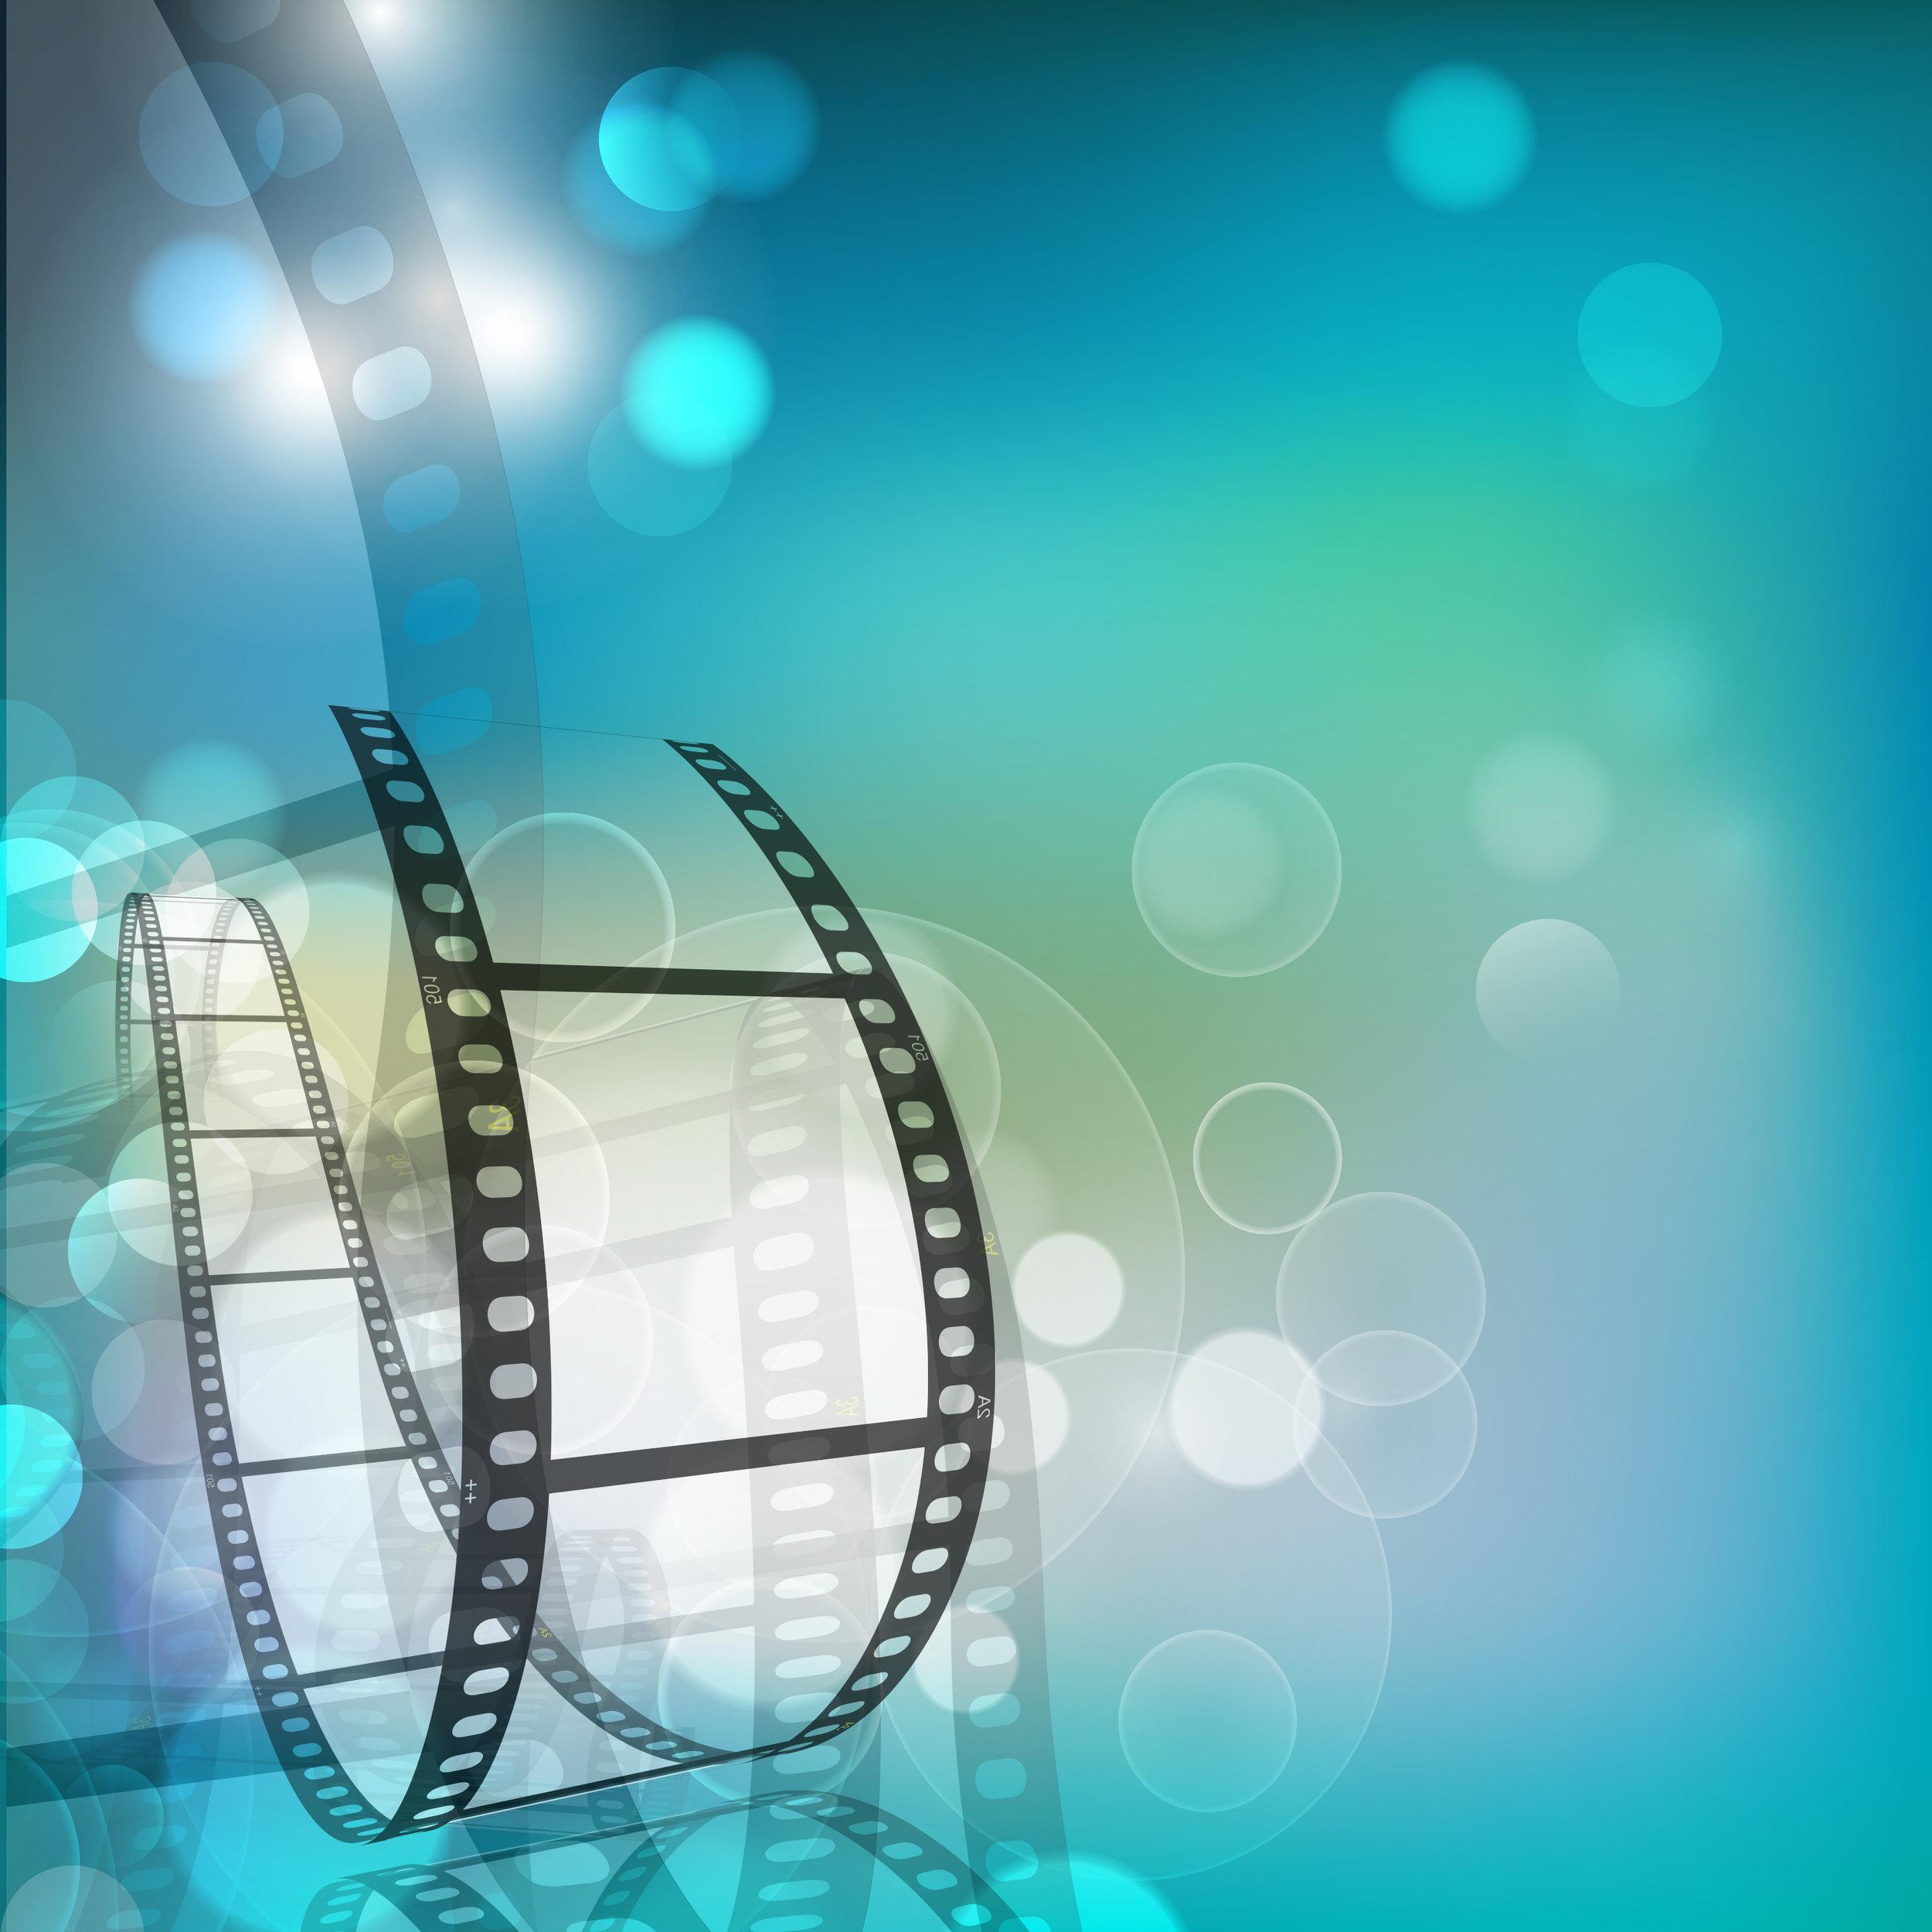 film-stripe-or-film-reel-on-shiny-movie-background-10_f1D61Kju_L.jpg